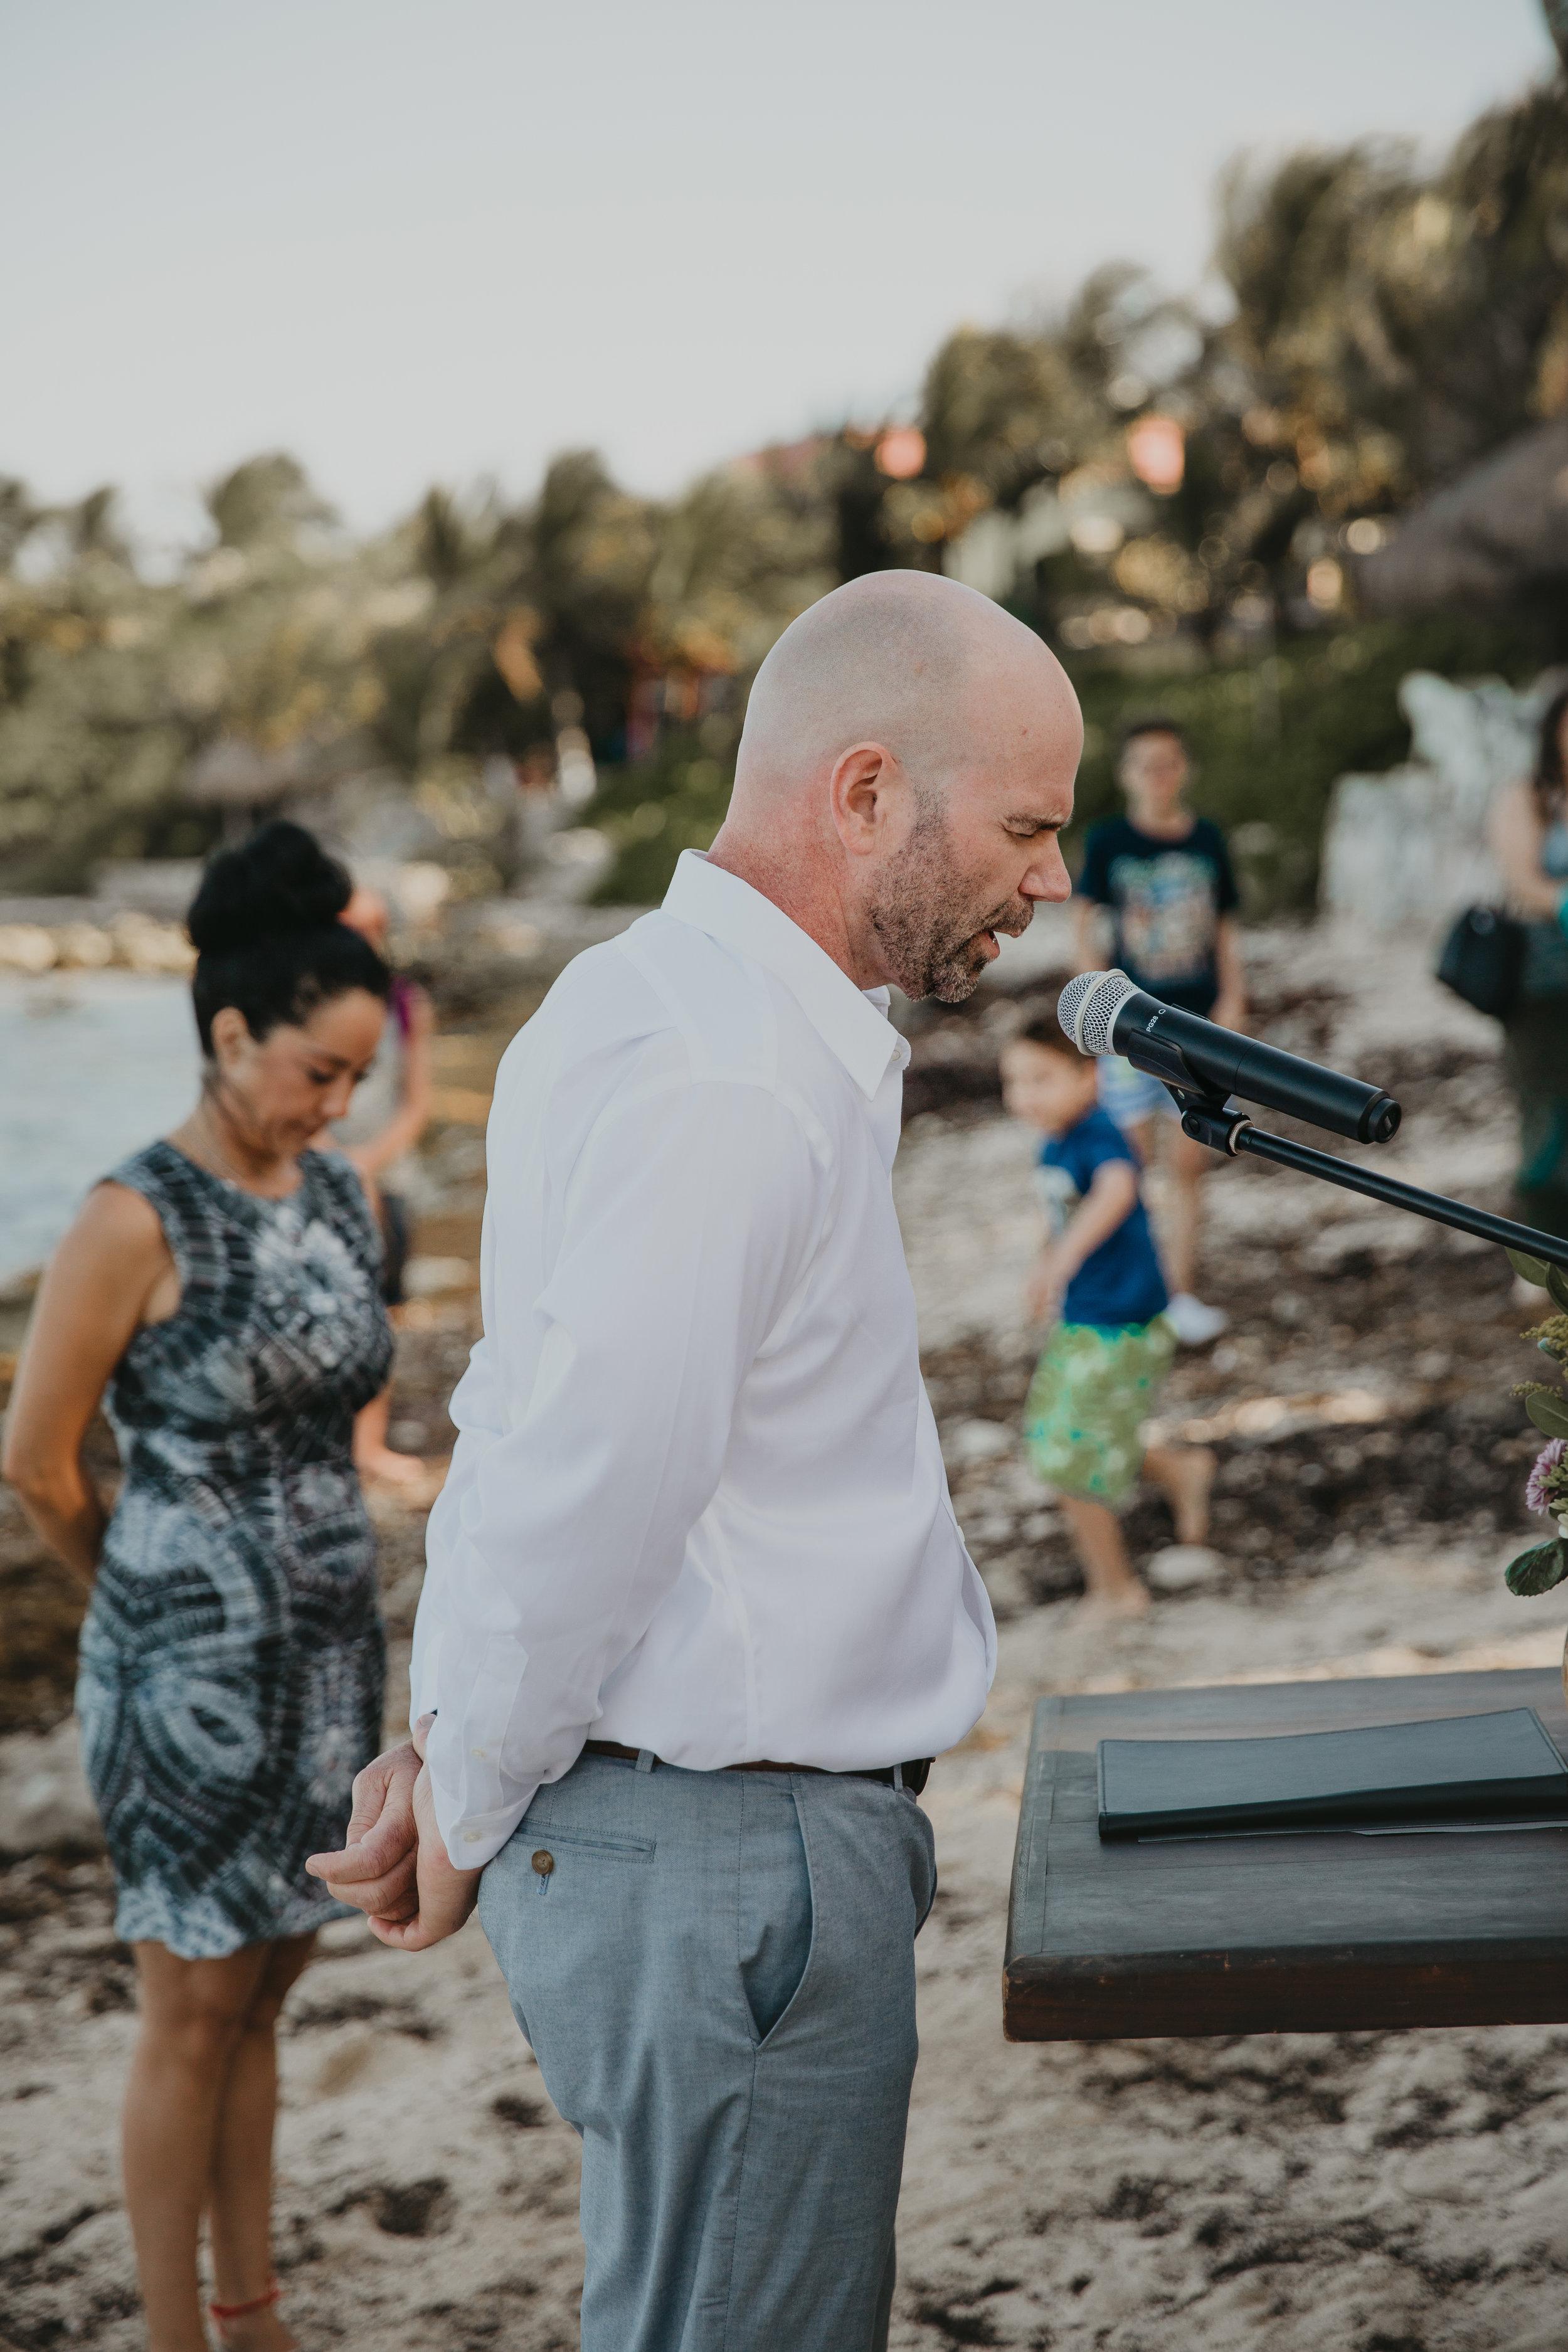 Nicole-Daacke-Photography-beachfront-akumal-destionation-wedding-tulum-mexico-elopement-photographer-destination-wedding-inspiration-sunset-champagne-pop-boho-bride-ocean-tropical-bohemian-tulum-wedding-photos-156.jpg